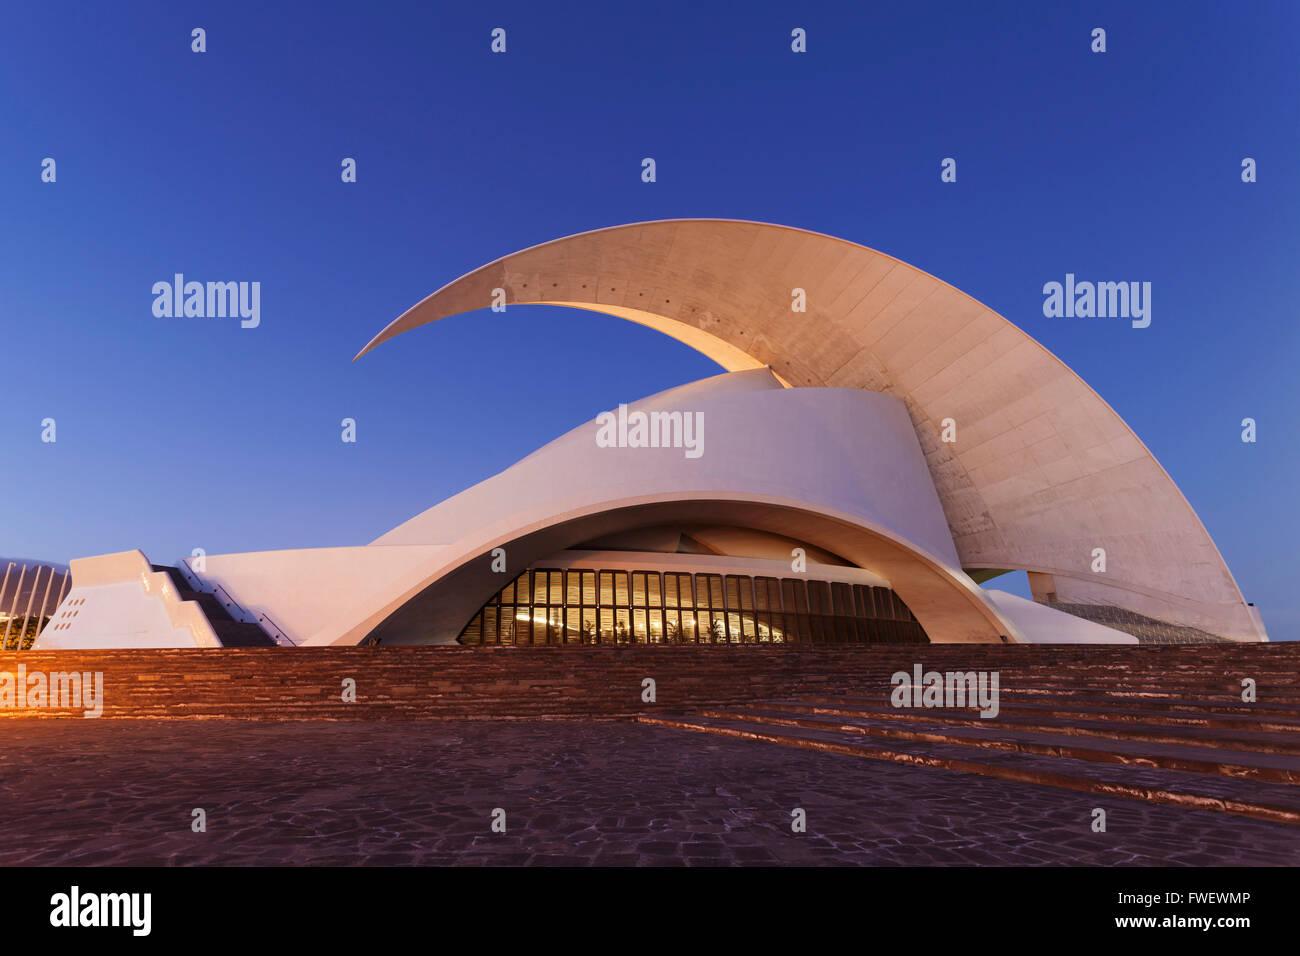 Auditorium by Santiago Calatrava, Santa Cruz, Tenerife, Canary Islands, Spain, Europe - Stock Image